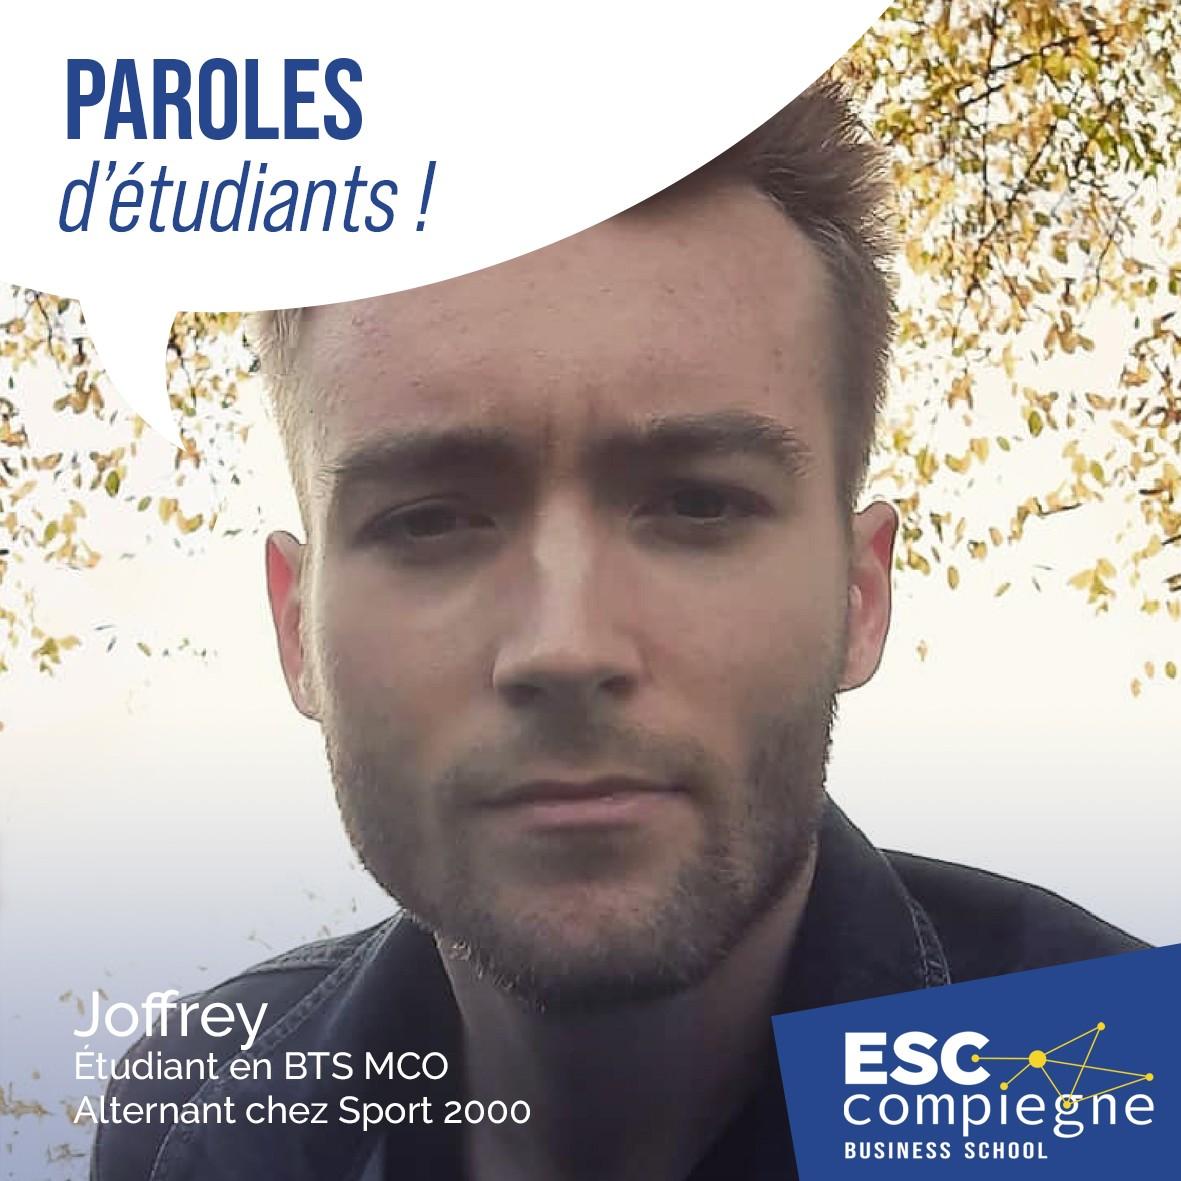 ESCC-Temoignage-Joffrey